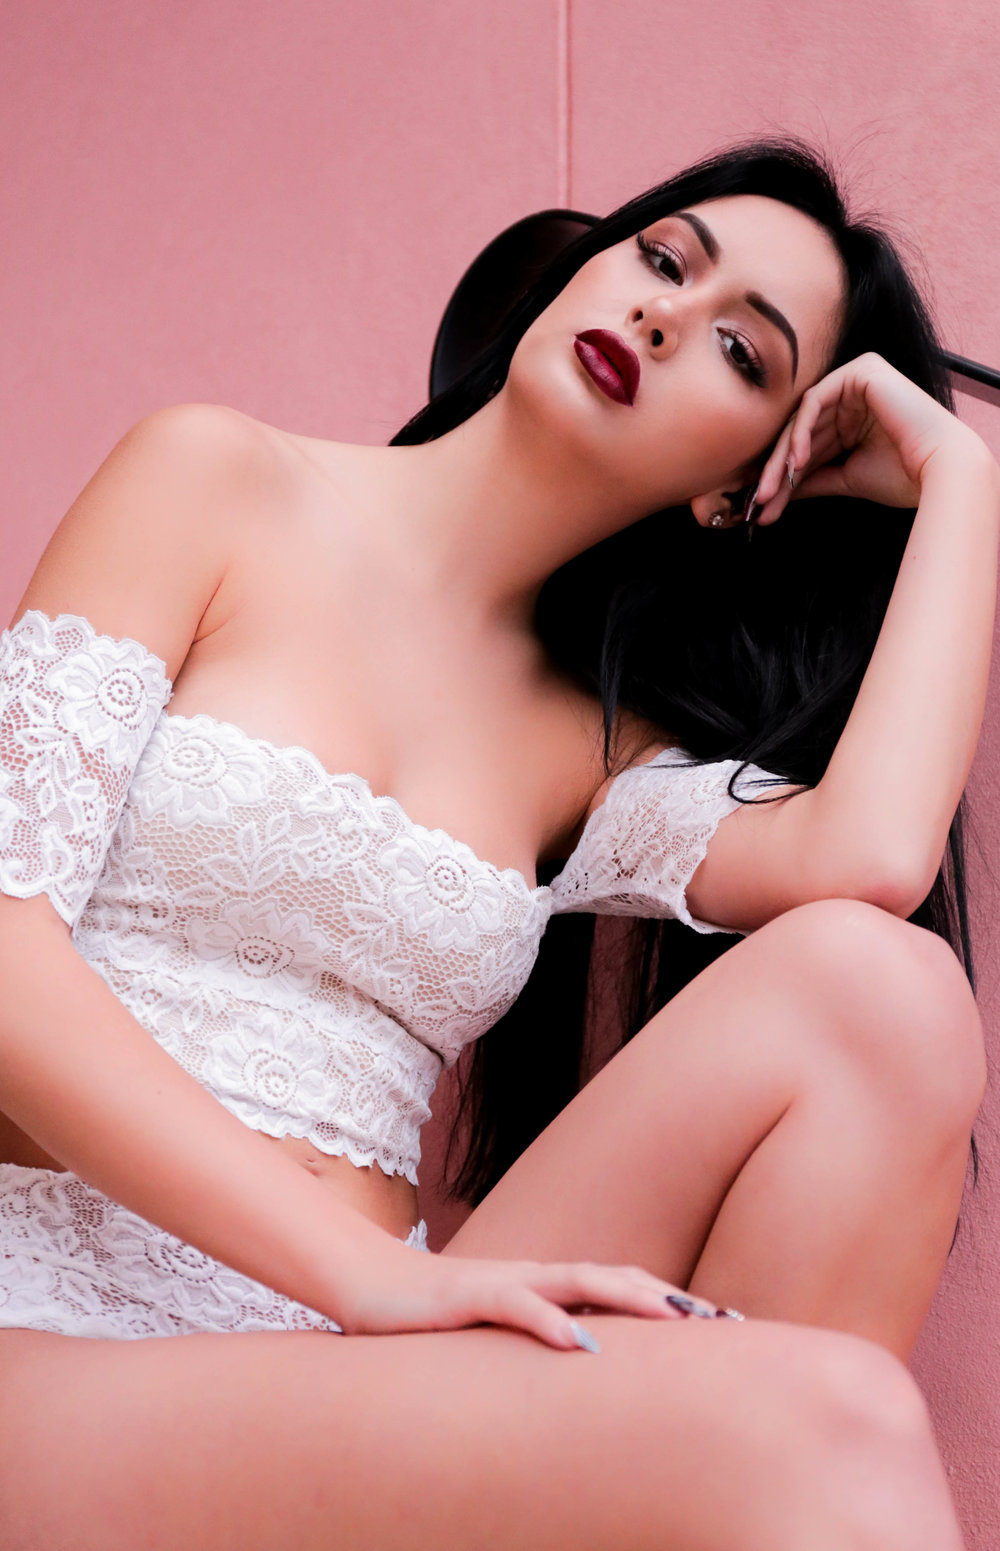 Lazy Girl Lingerie - Ivy Lingerie Set, off the shoulder crop top, white lace, bridal, sexy lingerie, lace lingerie, handmade lingerie, indie lingerie